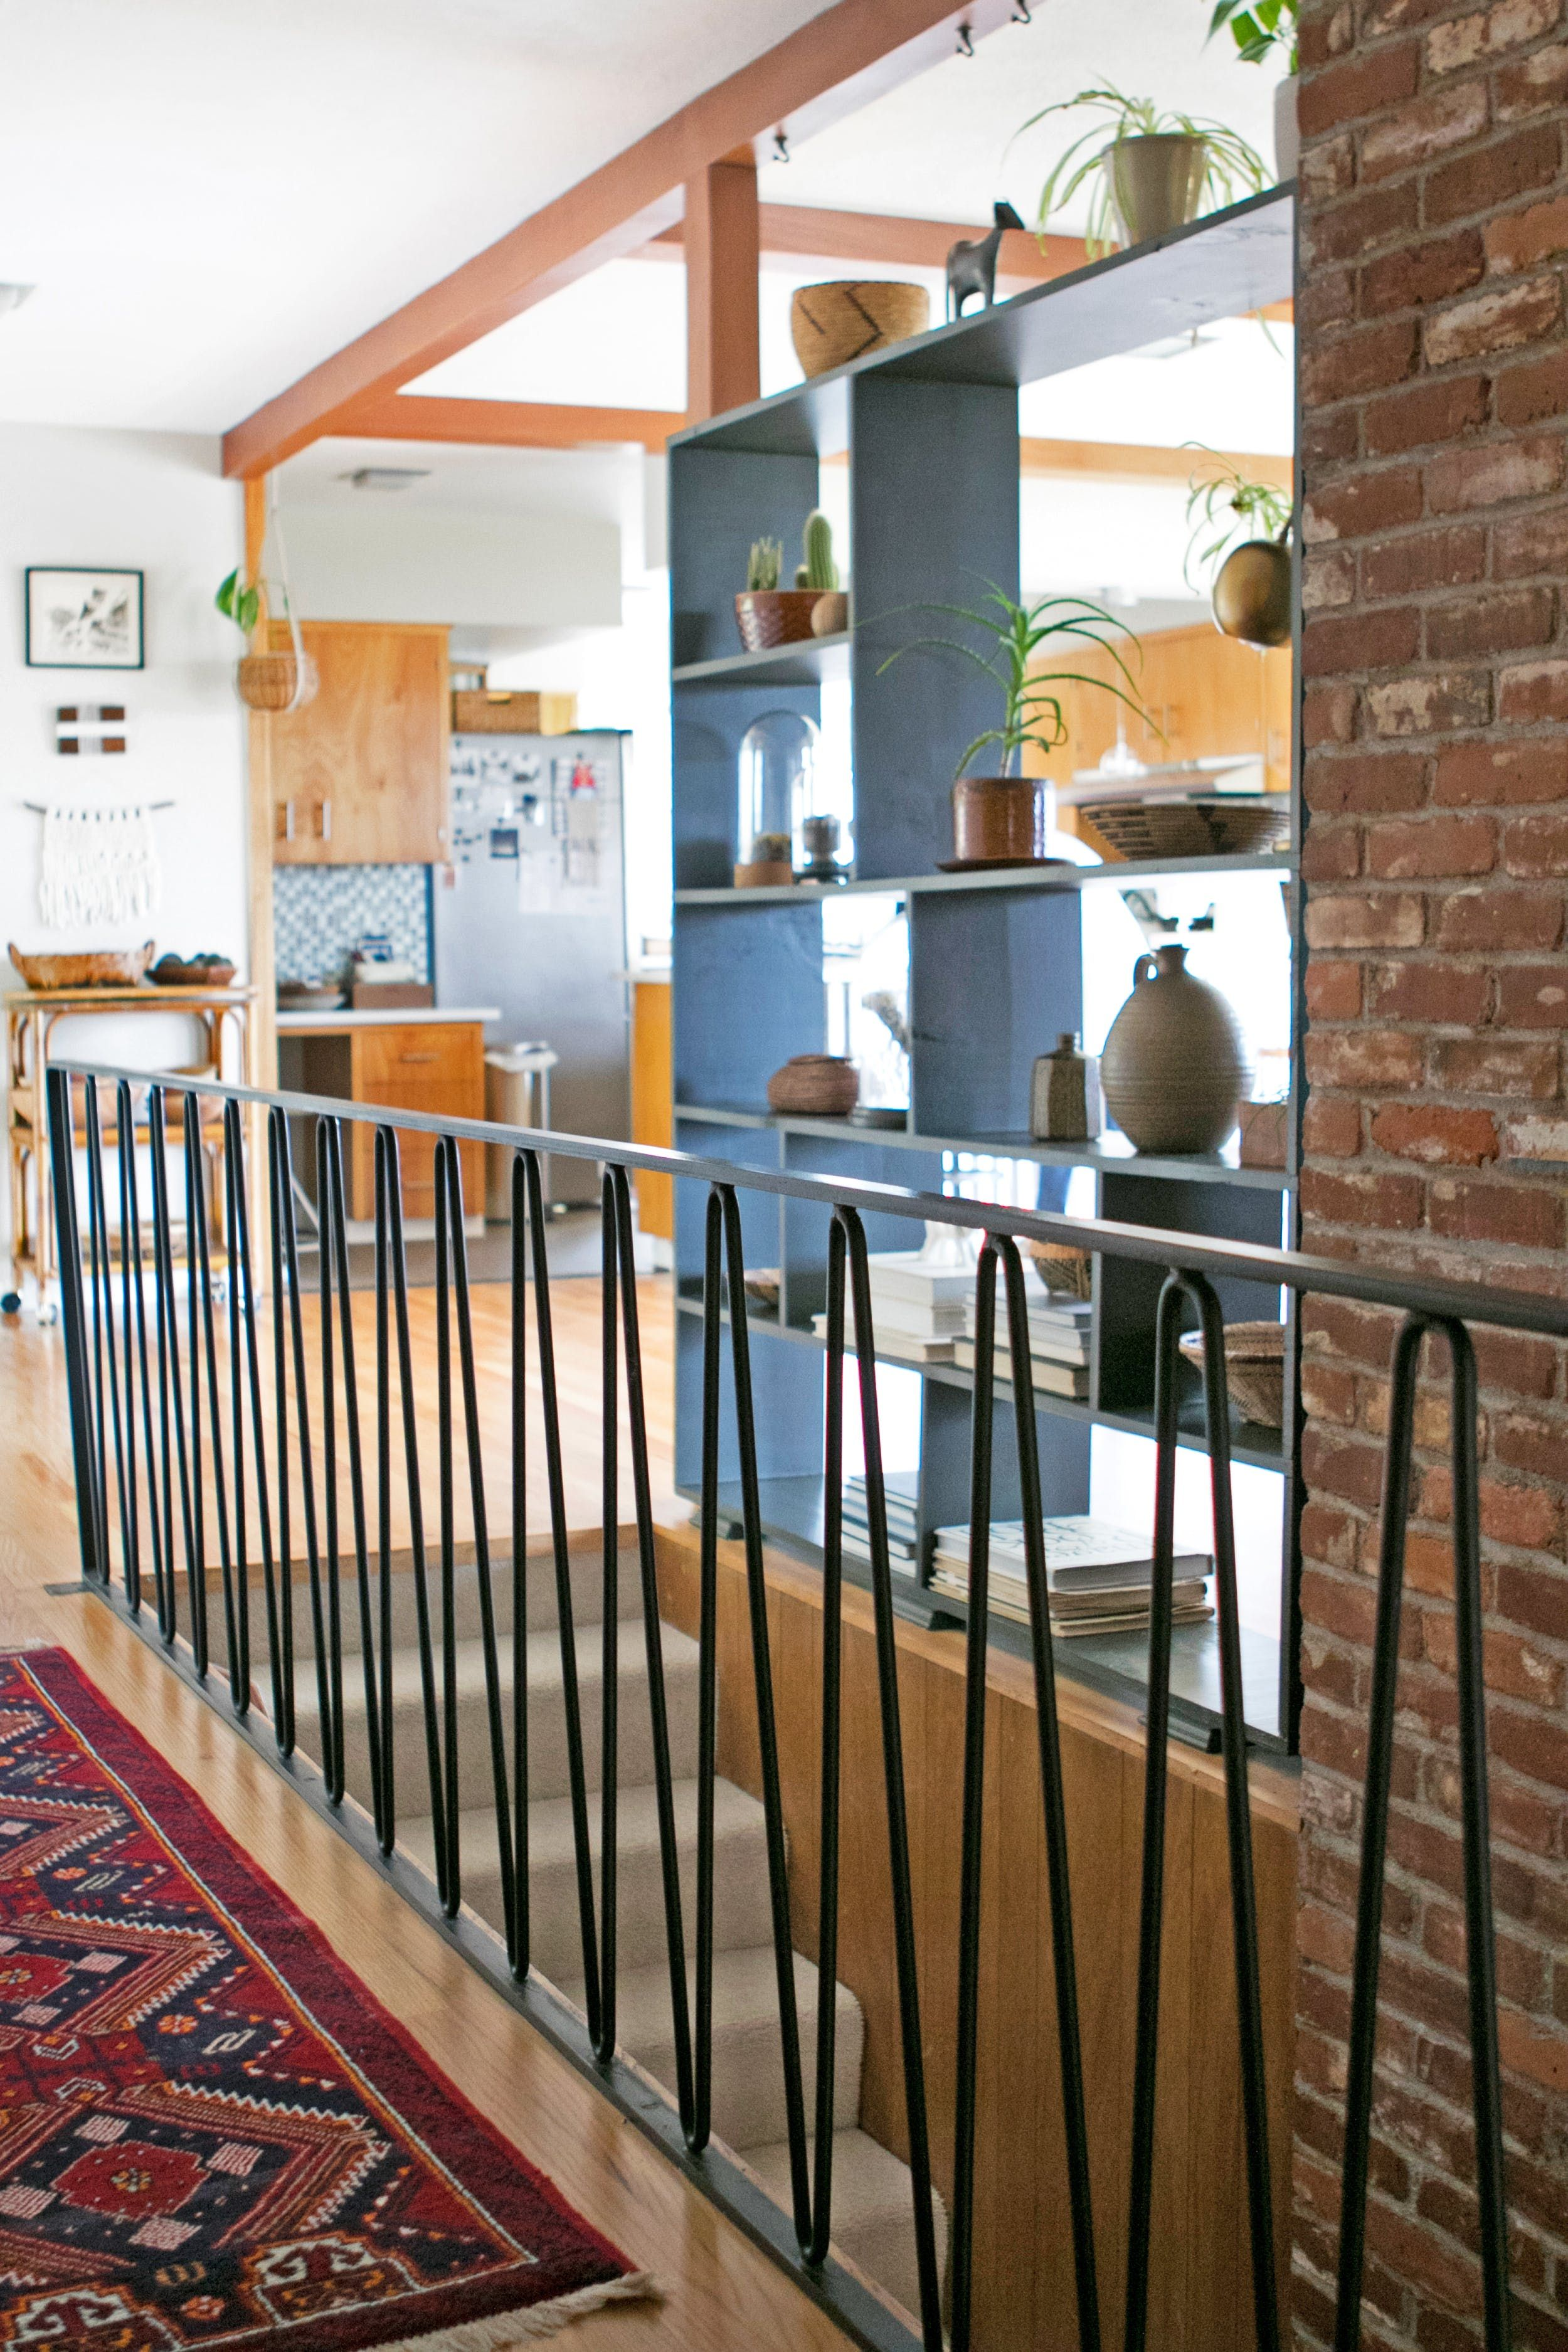 A 1960 Home Balances Mid Century Modern Vintage Styles Mid   Mid Century Modern Handrail   Porch   Interior   Art Deco   Wooden   Railing